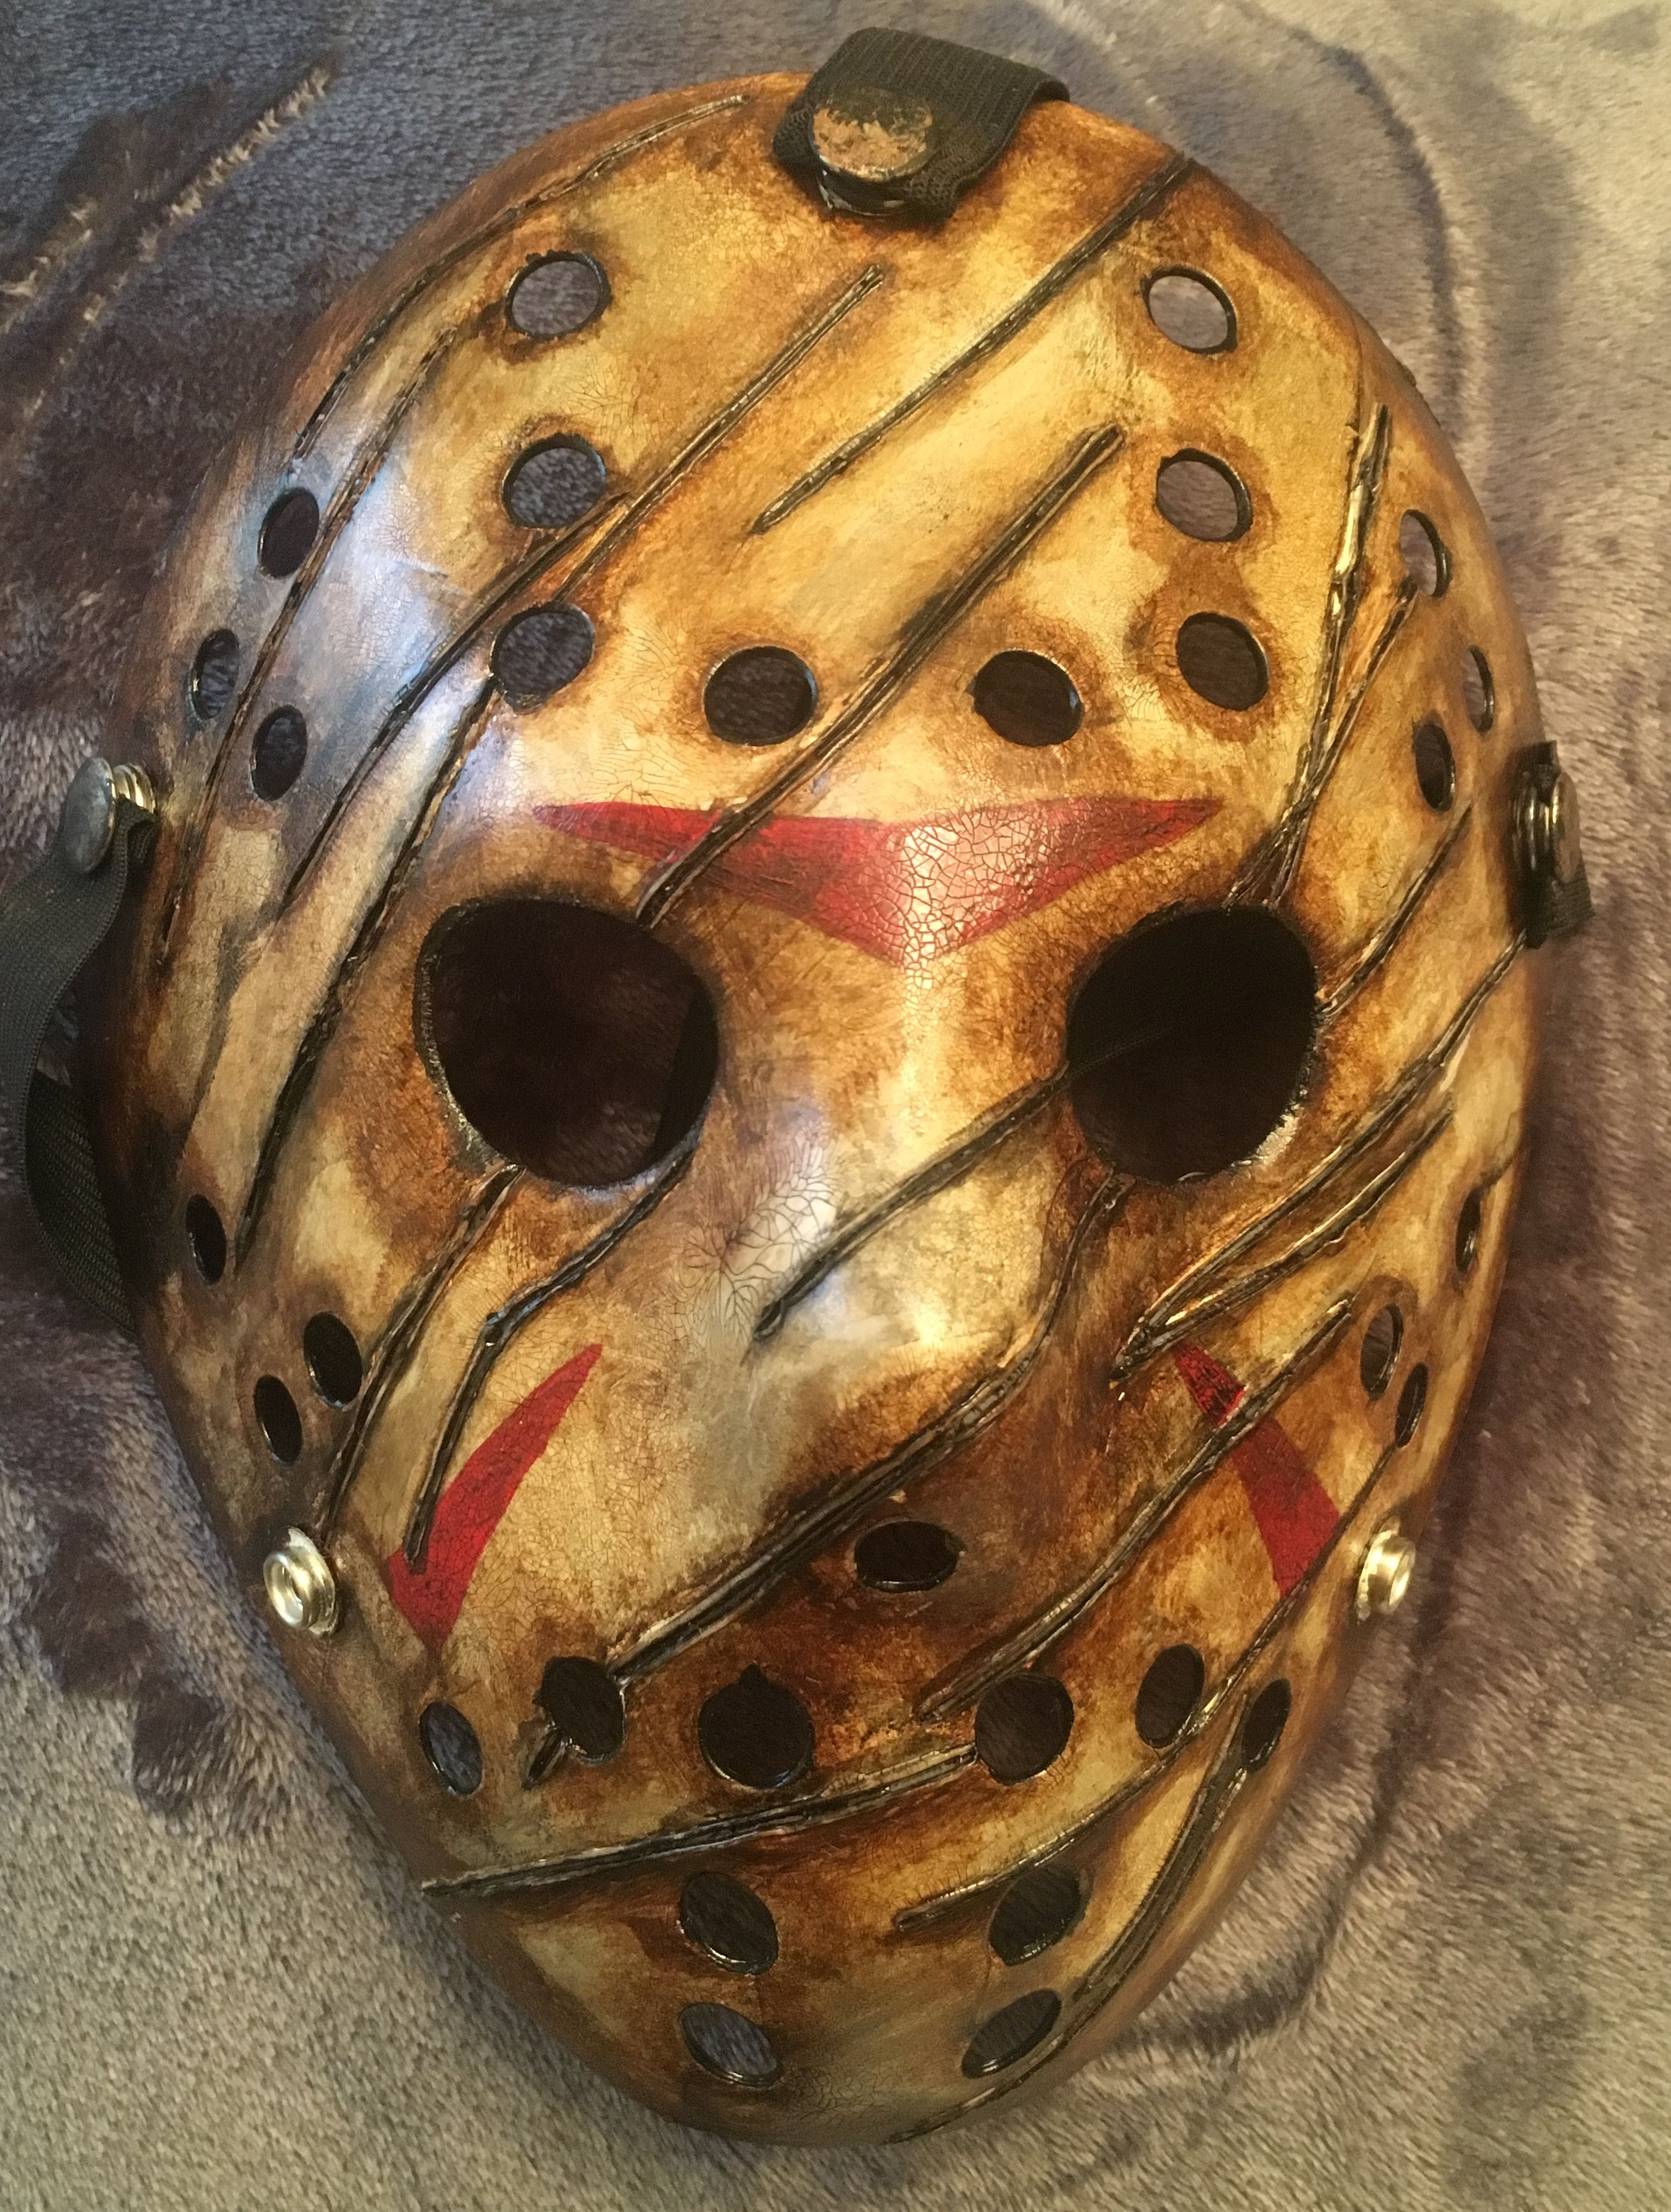 7674ac56ba9 Freddy vs Jason mask. Fiberglass mold from original Friday the 13th mask.  By creepy hollow studios